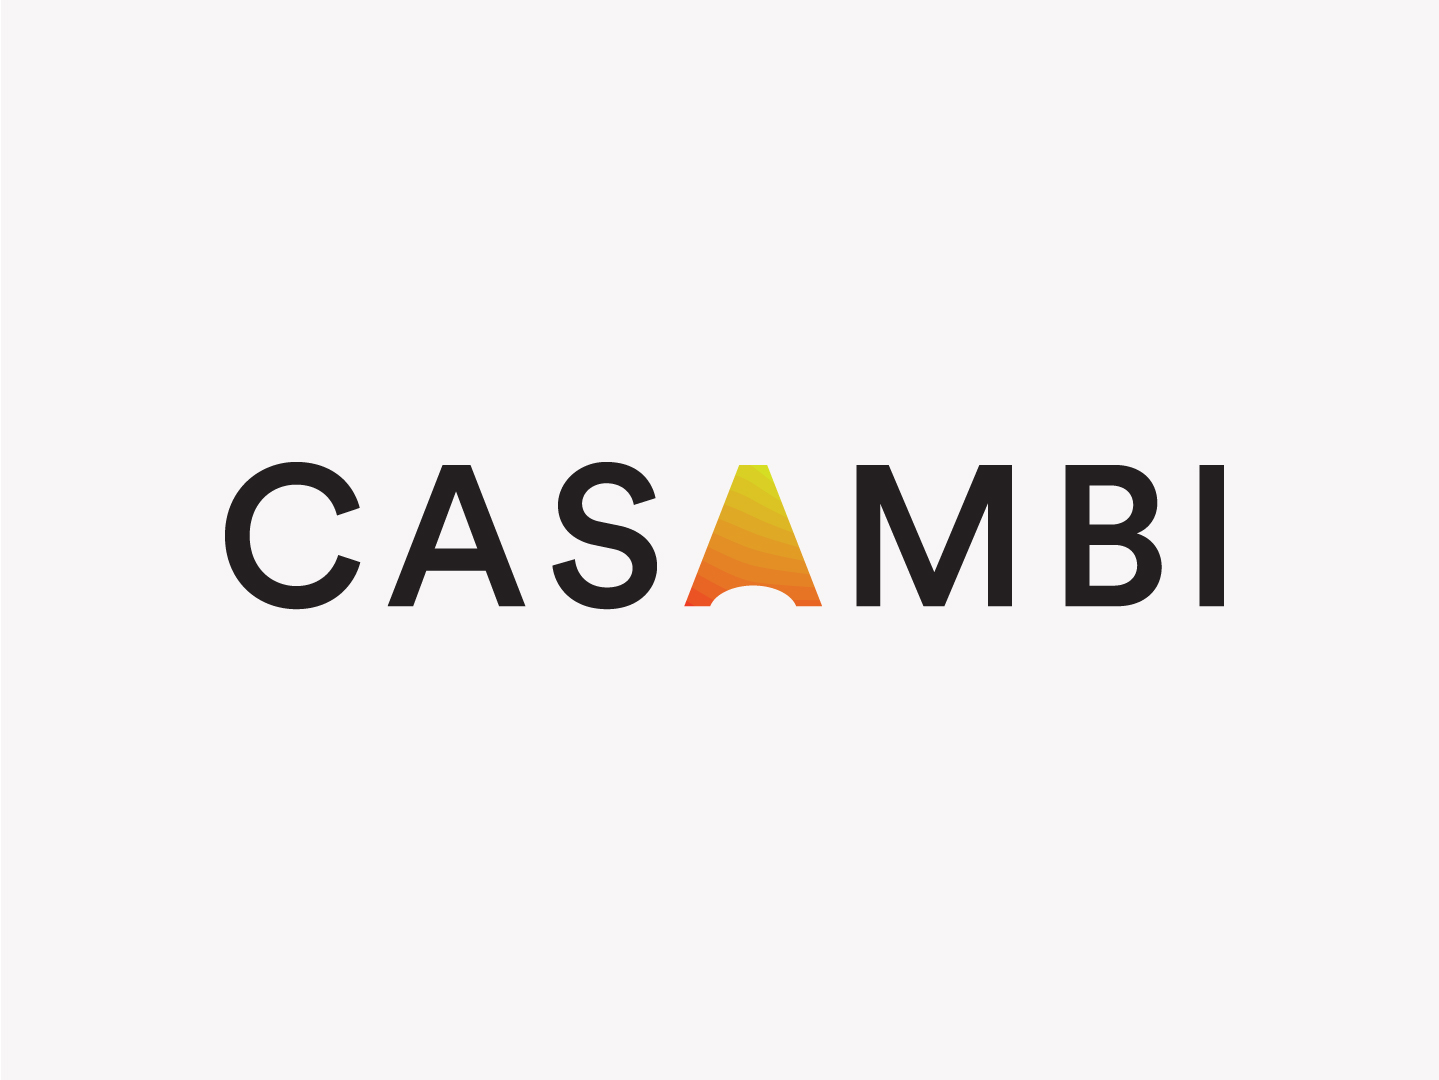 Casambi-logo-positiv-1439x1080px